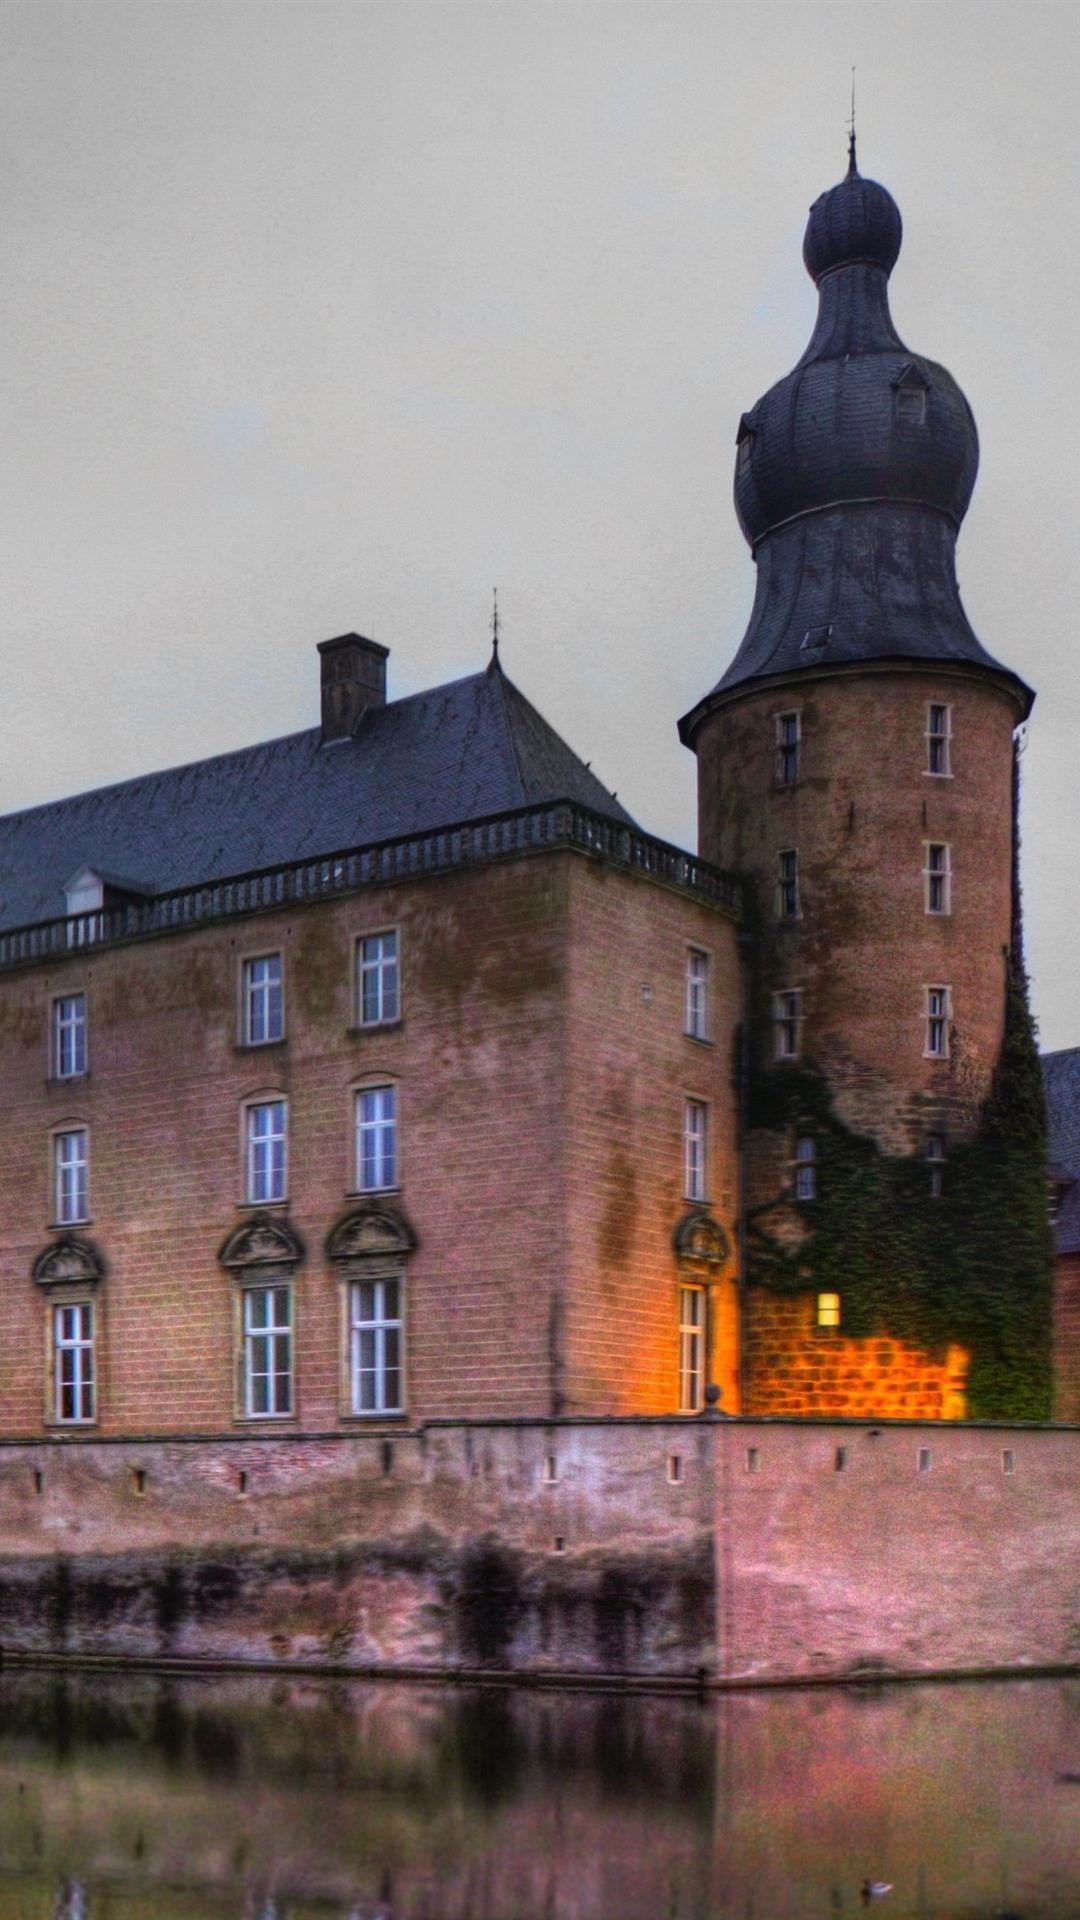 Обои дома, гамбург, германия, ночь, башня, кран. Города foto 10